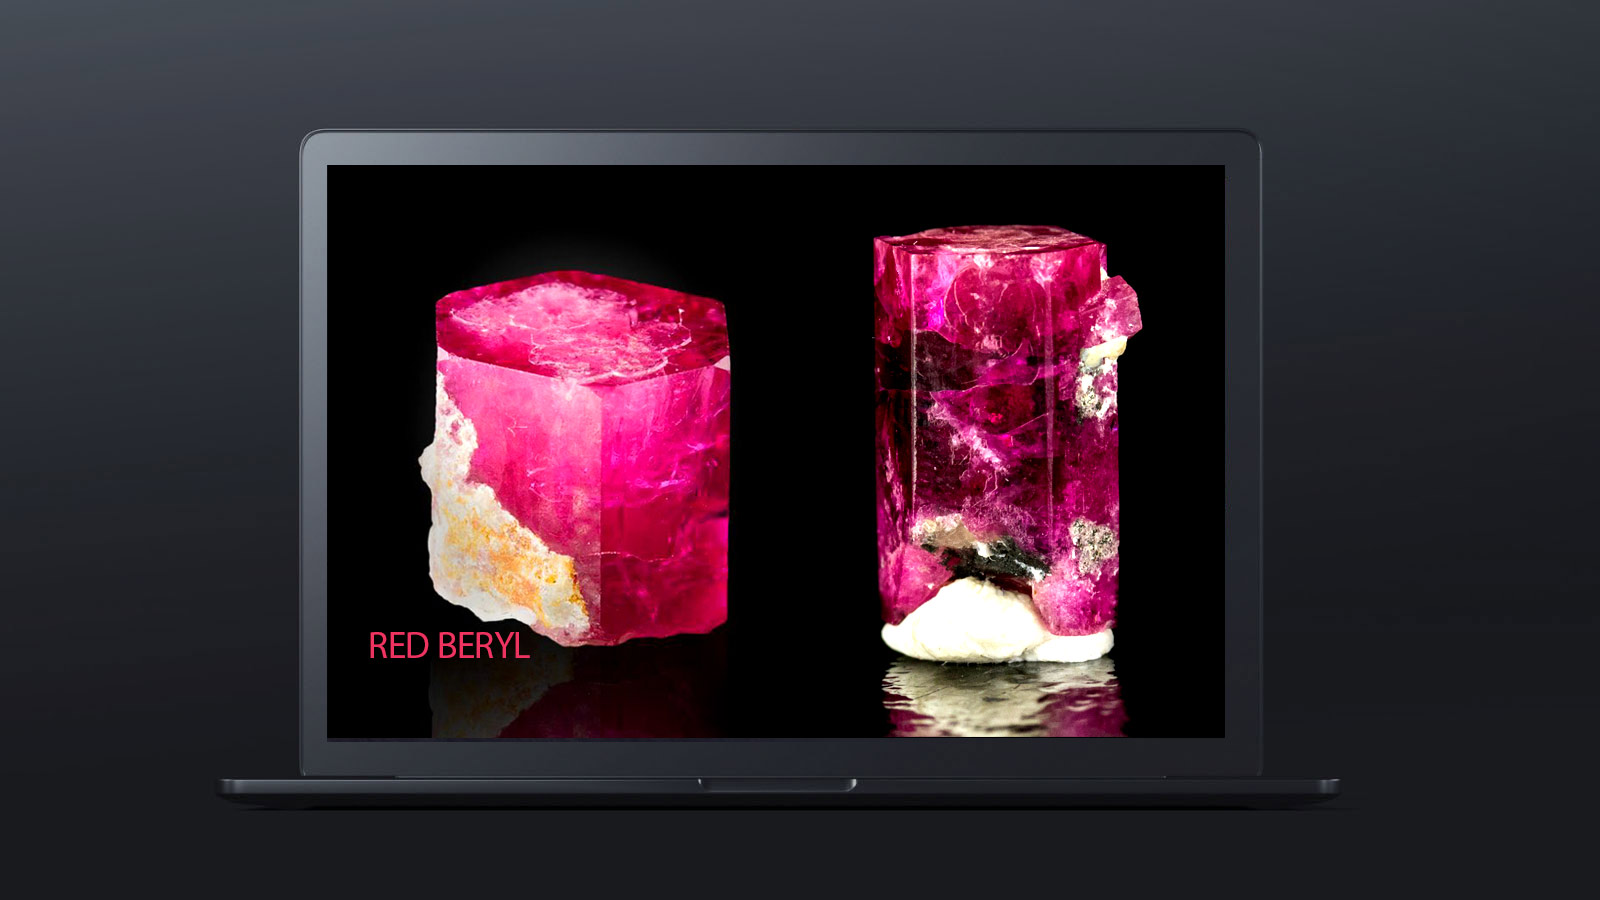 10 worlds rarest gemstones RED BERYL 2 - ده گوهر کمیاب دنیا کدامند؟